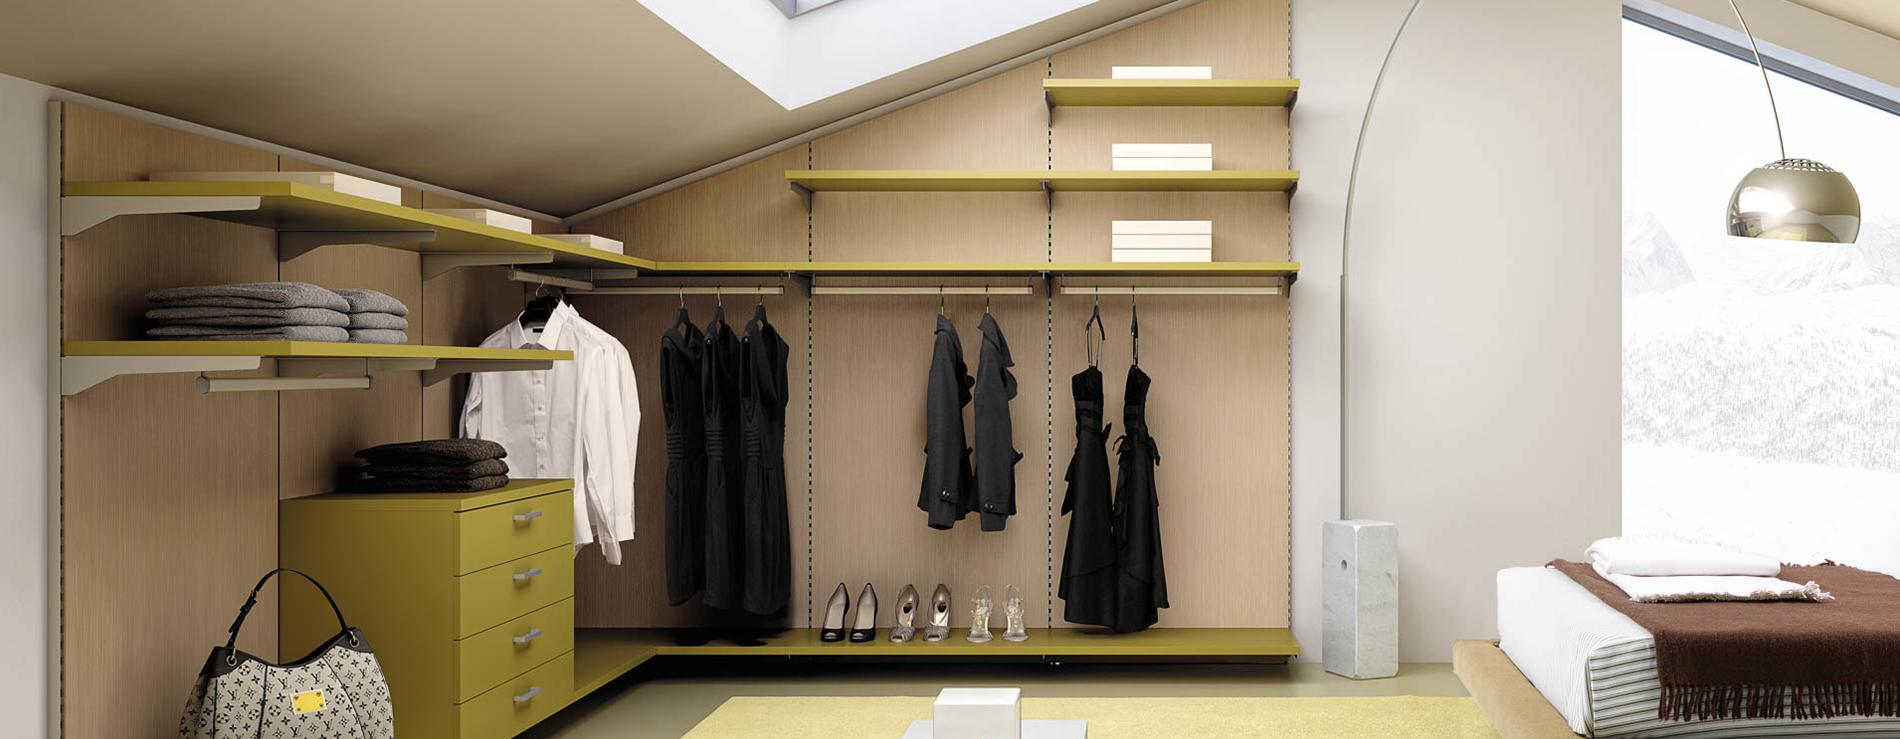 Cabina armadio 44 ferri mobili centro mobili - Mobili cabina armadio ...